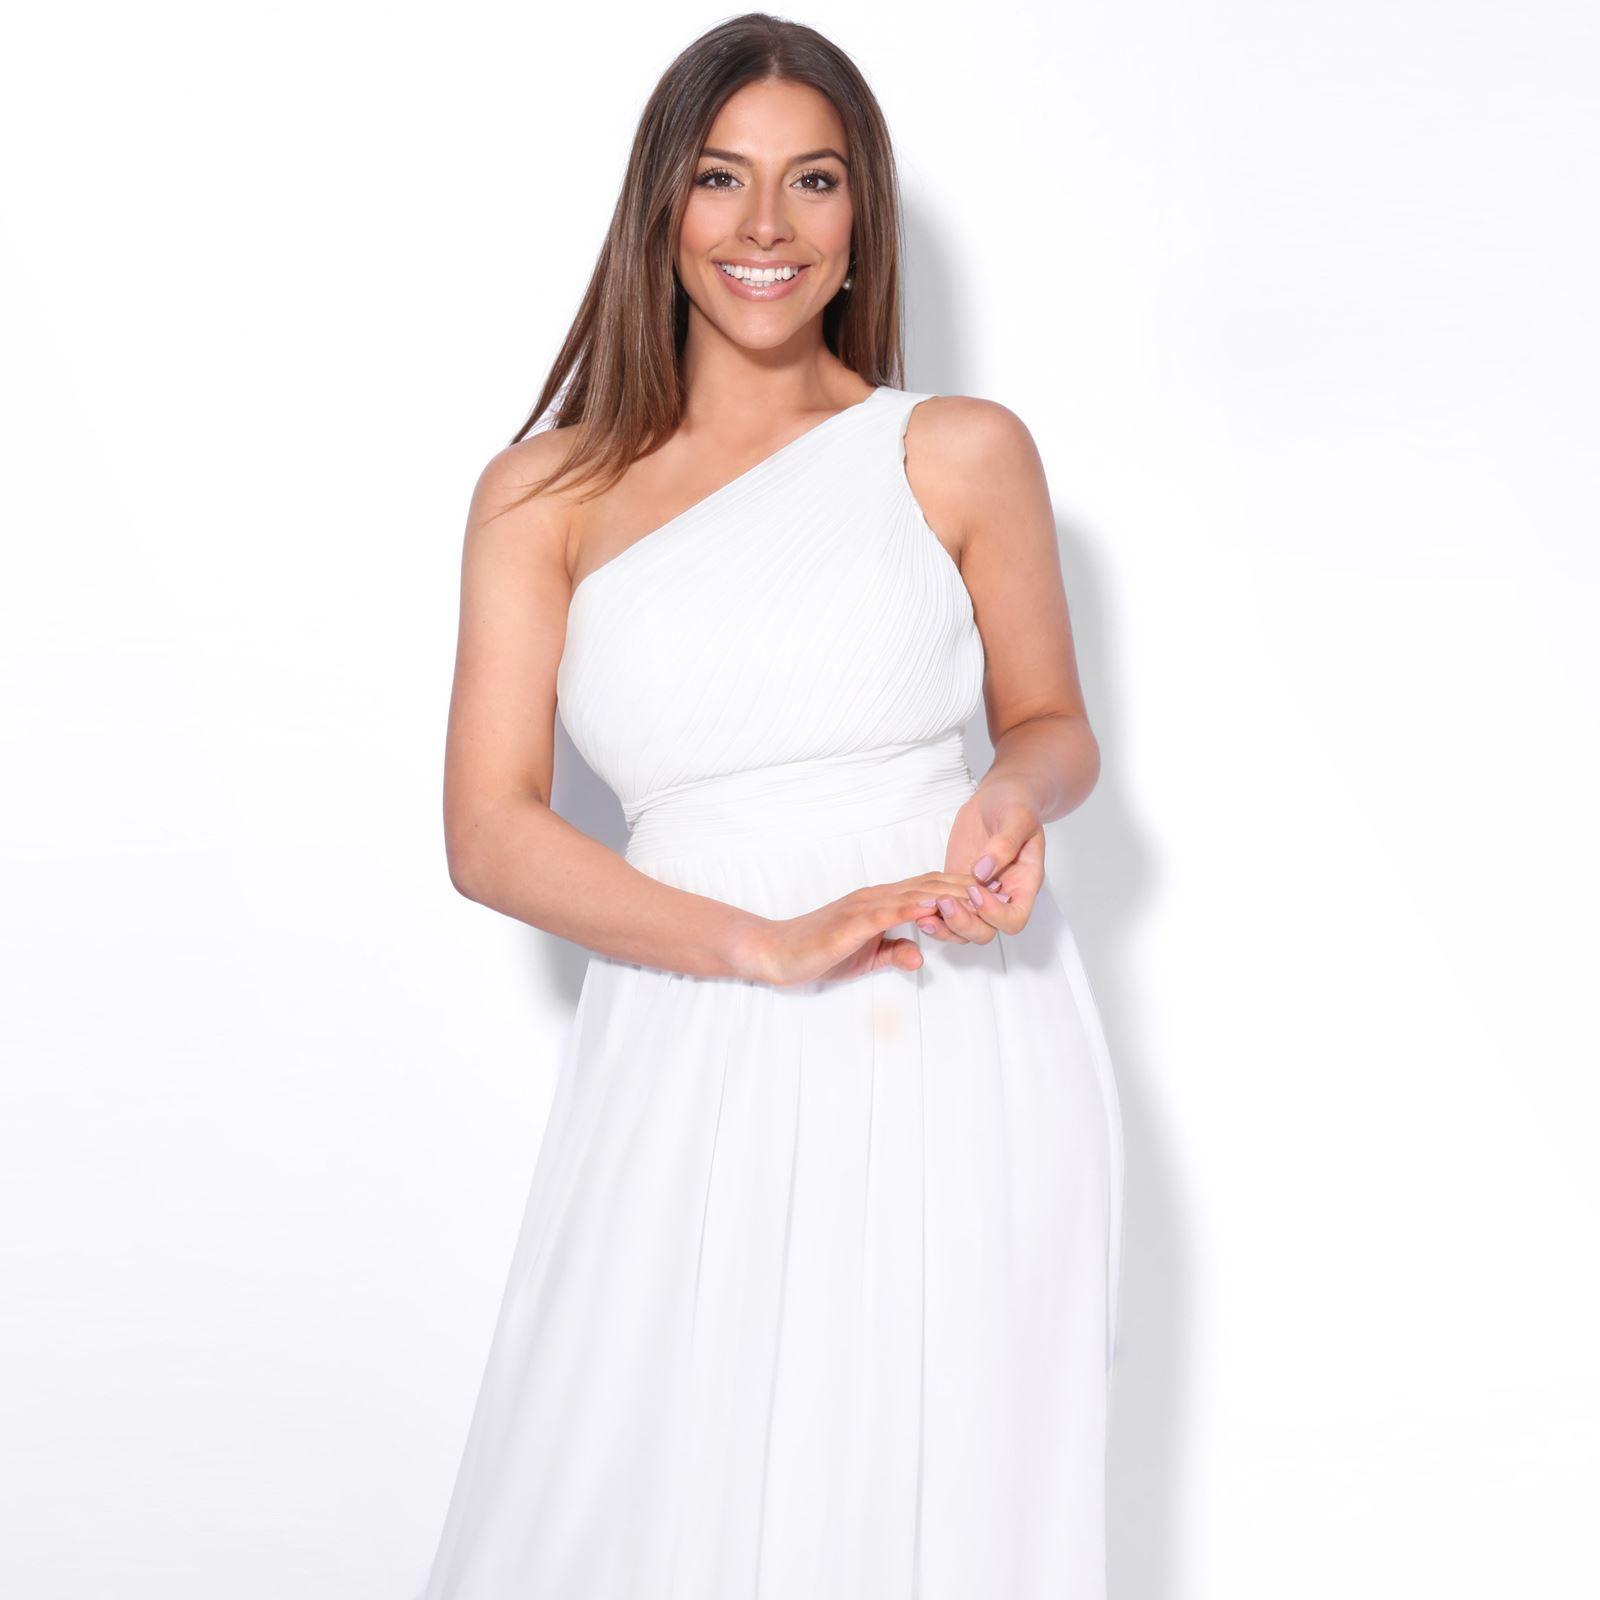 Womens-Wedding-Bridesmaid-Prom-Dress-Formal-One-Off-Shoulder-Long-Evening-8-18 thumbnail 78